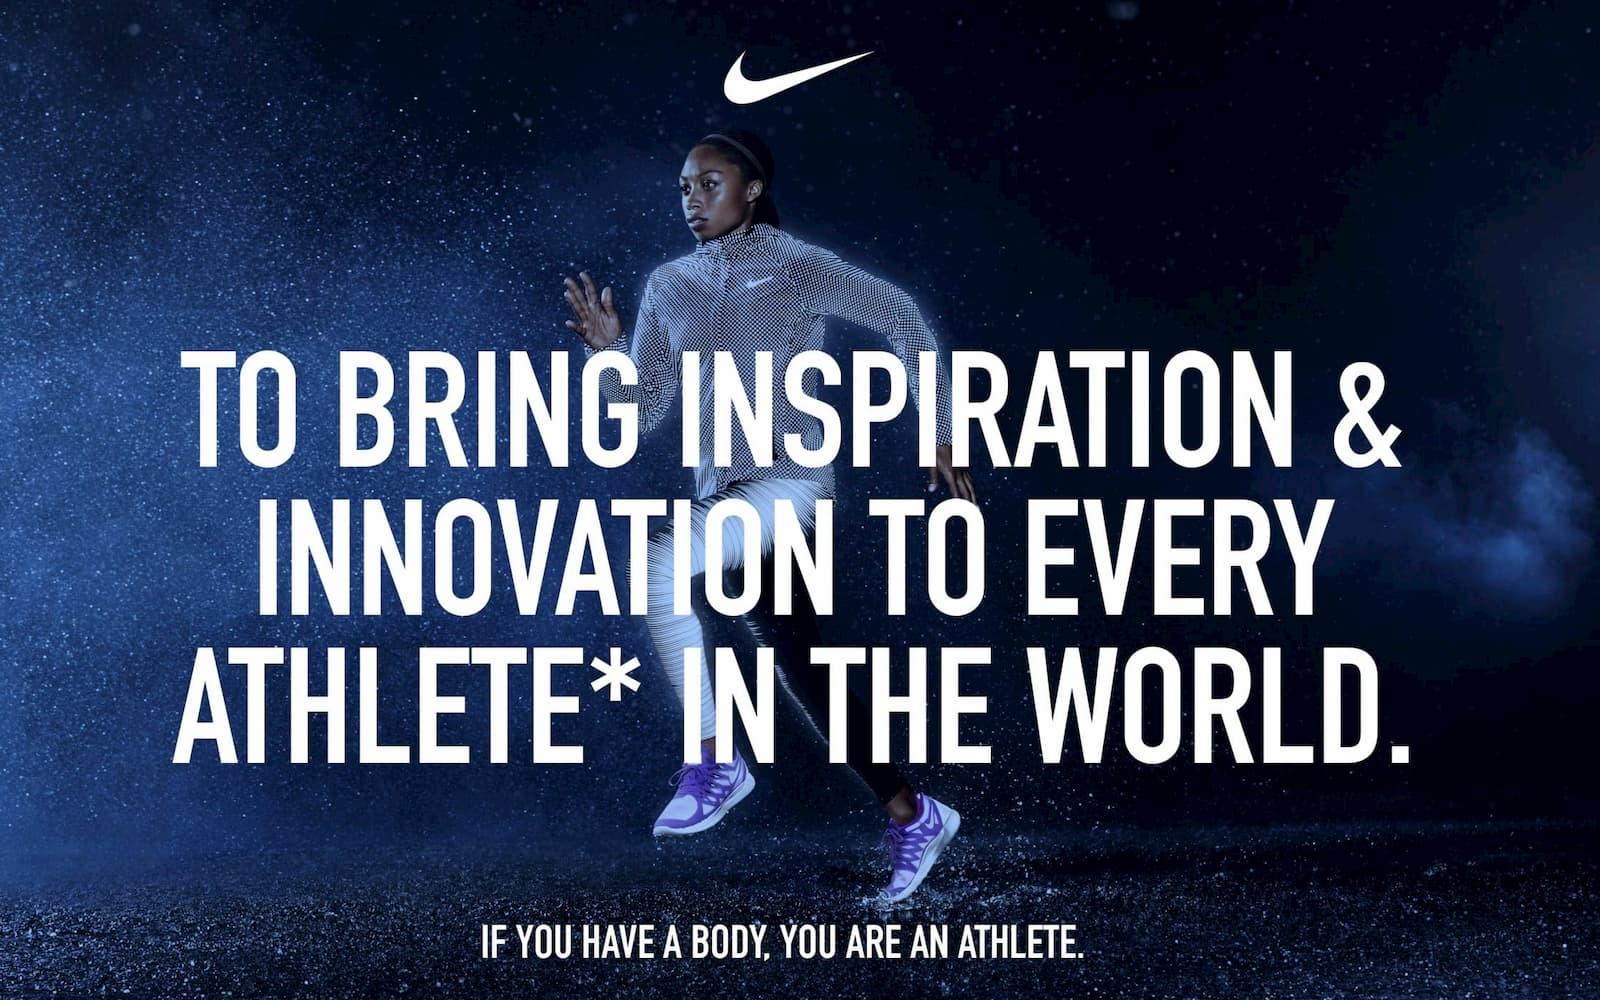 Nike brand promise